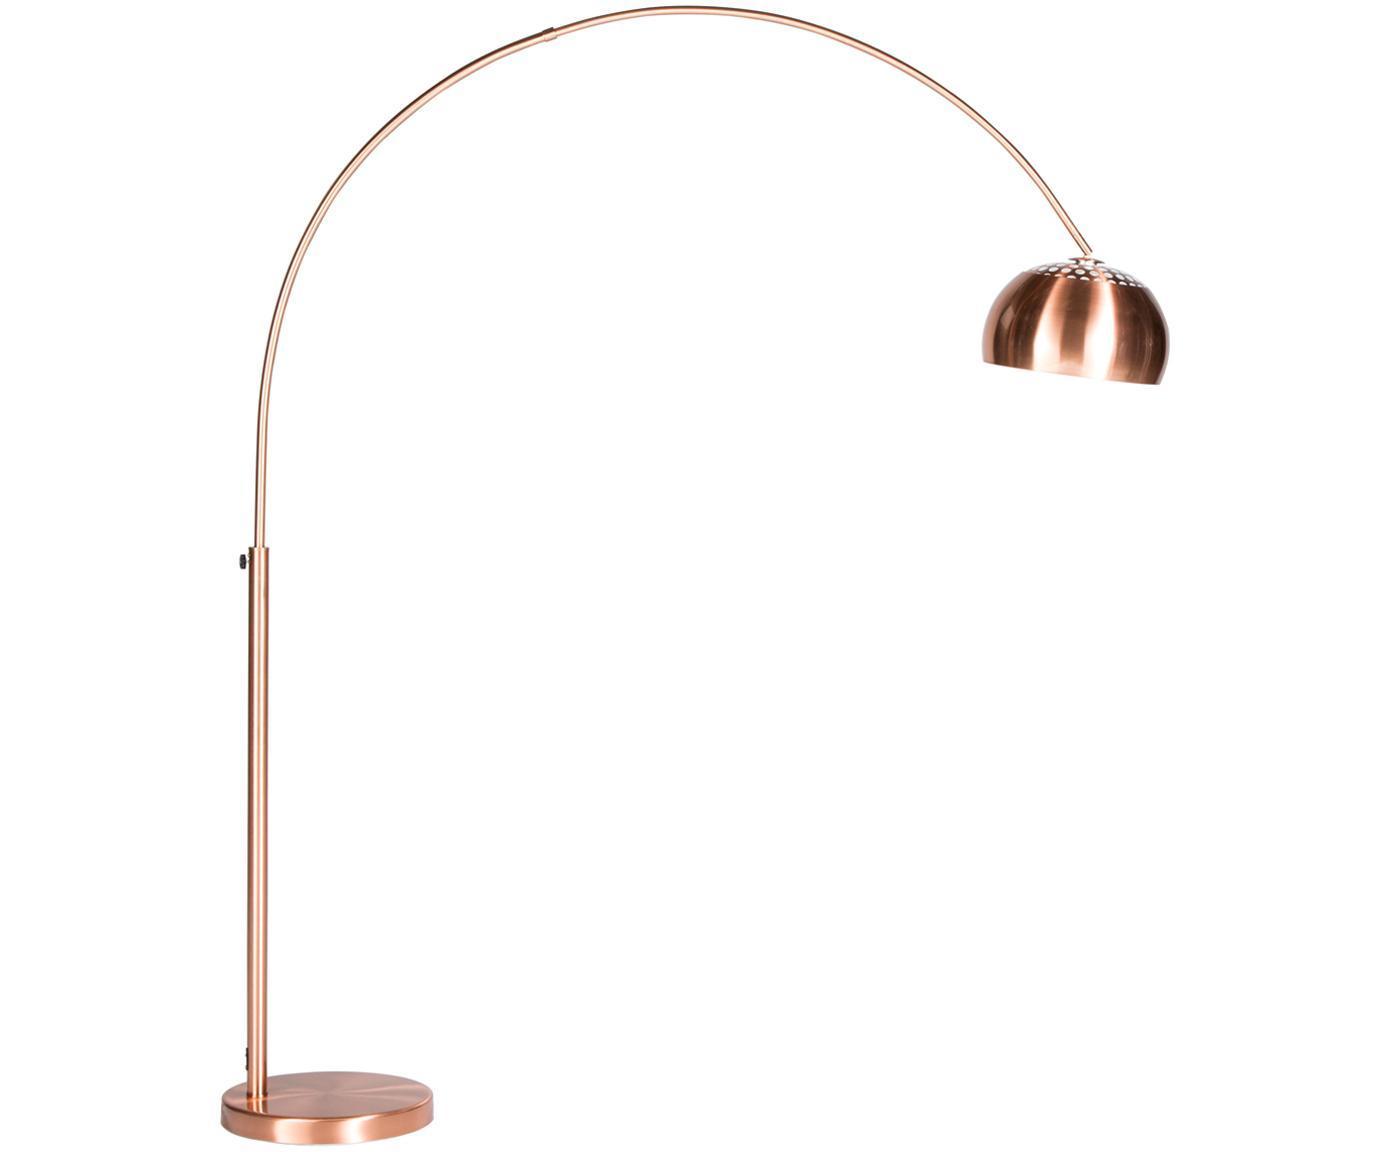 Bogenlampe Metal Bow, höhenverstellbar, Kupfer, 170 x 205 cm